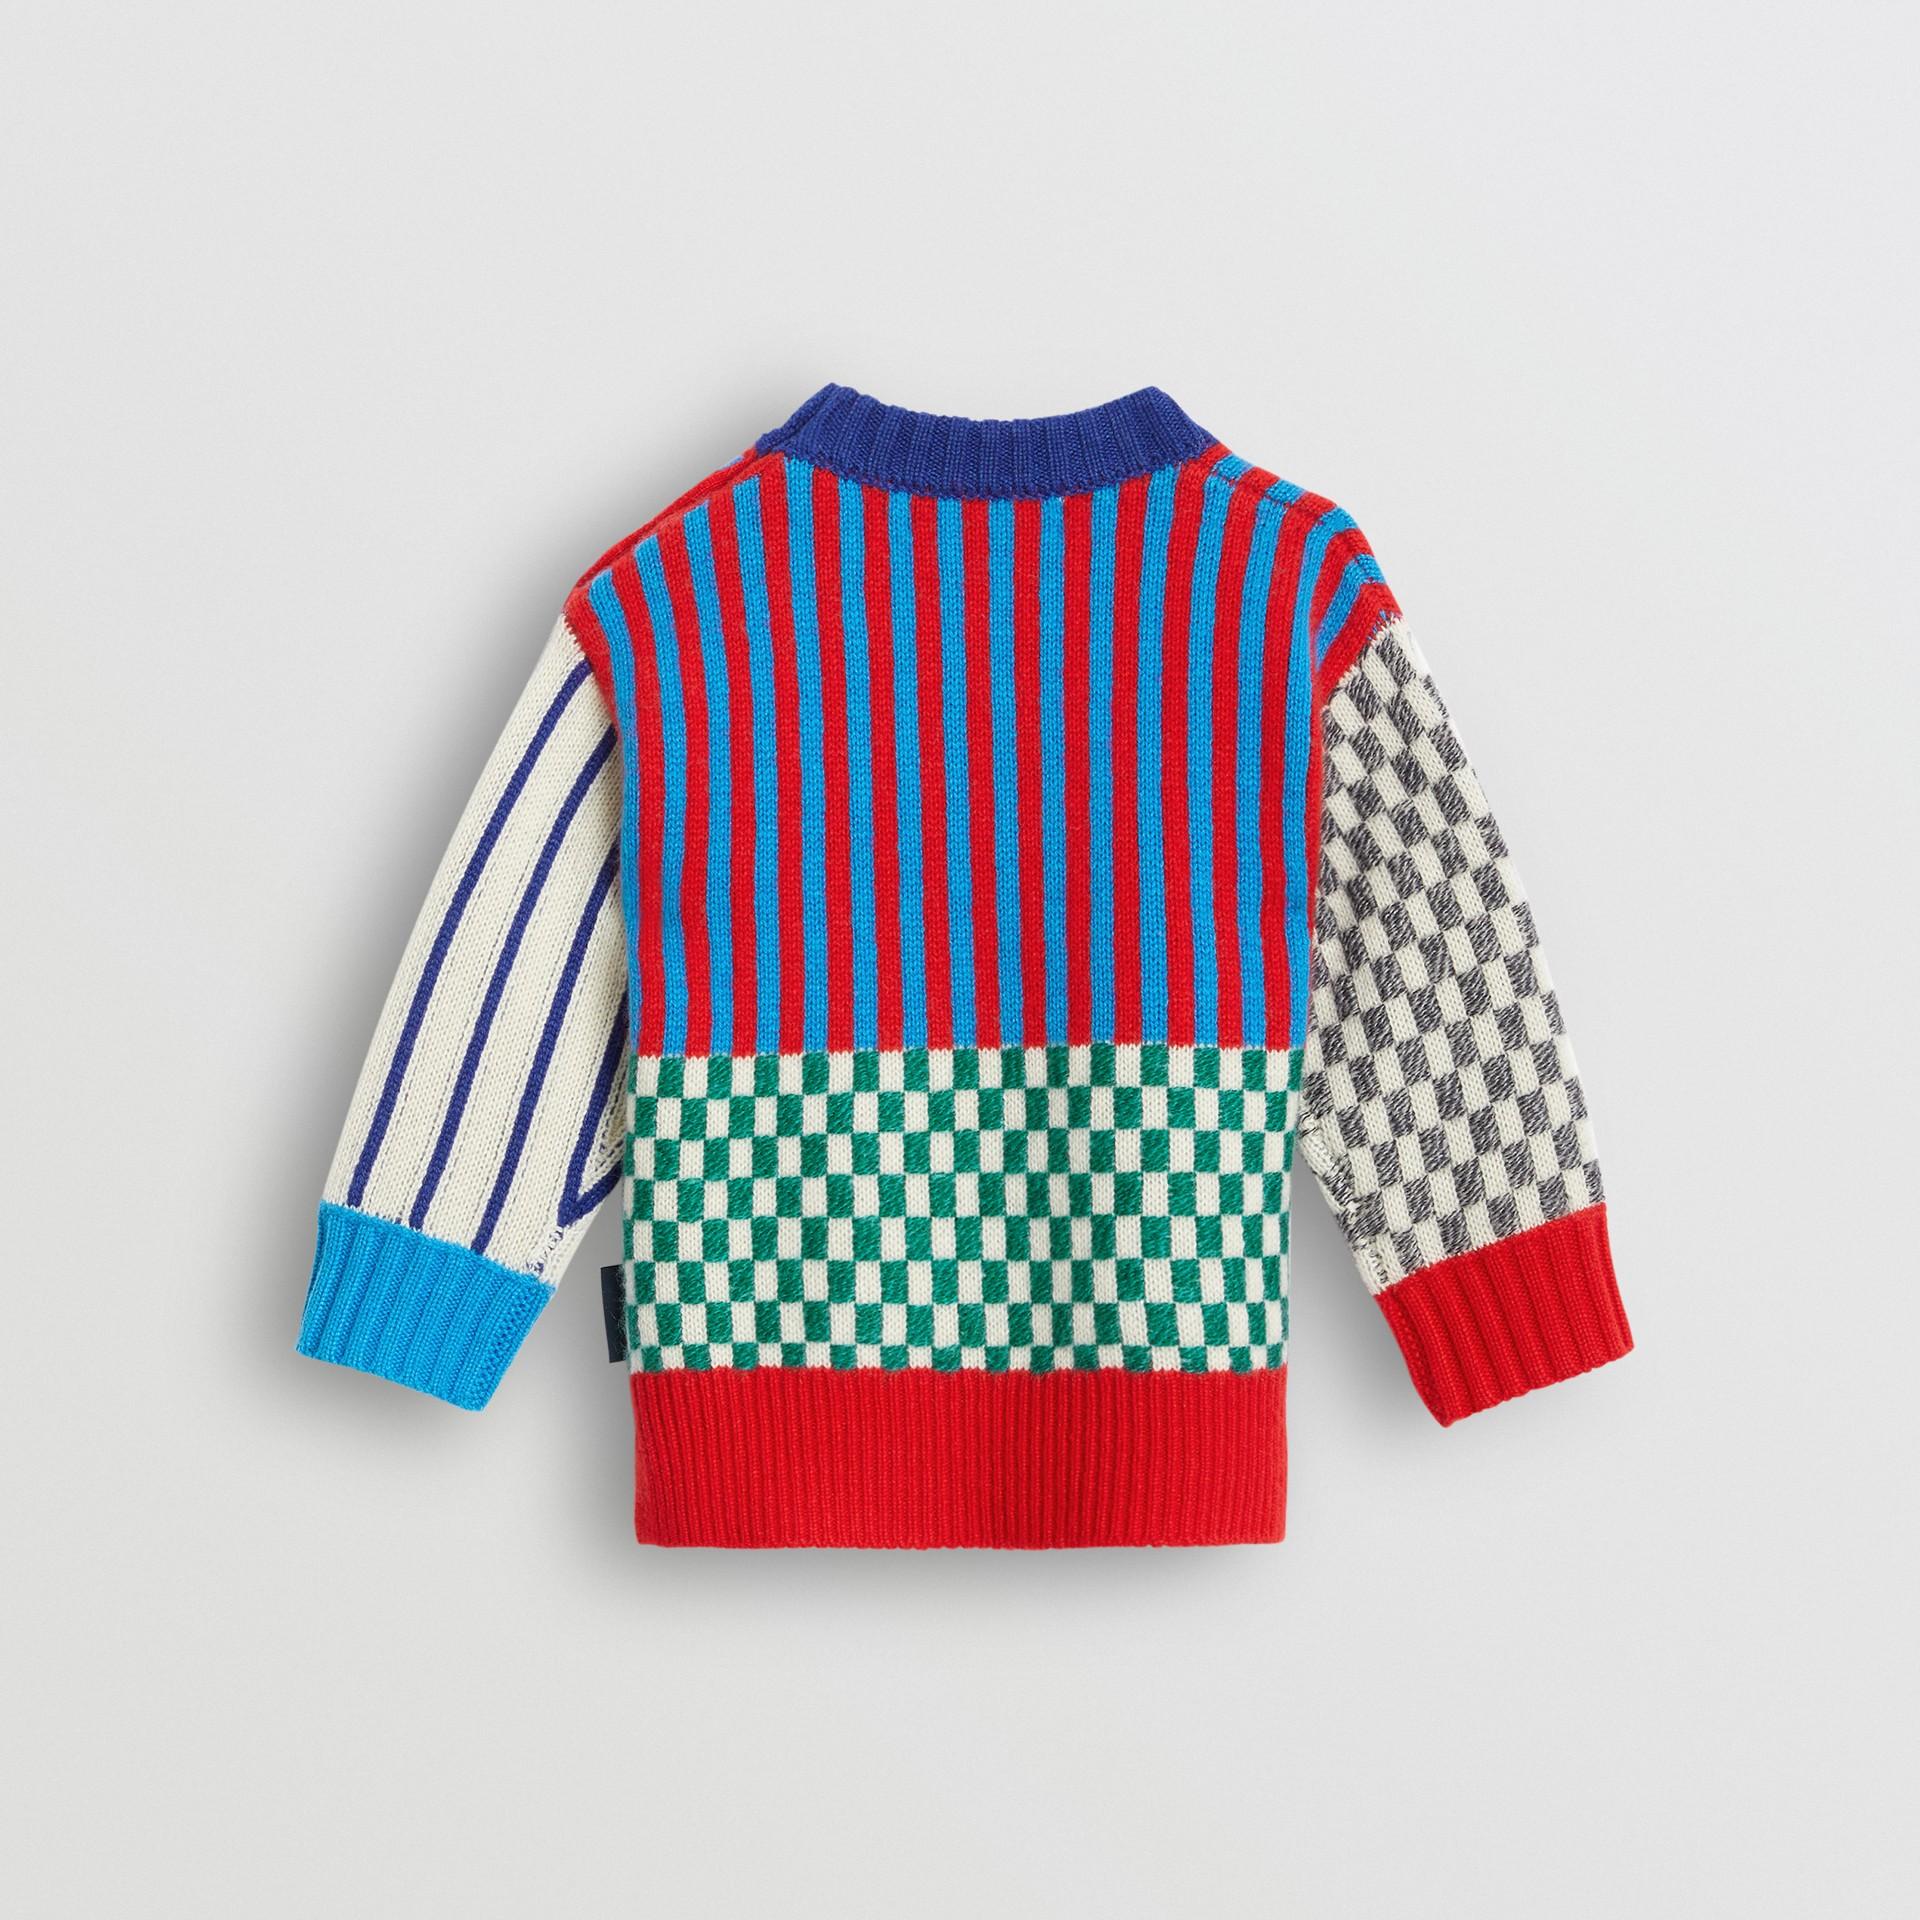 Graphic Cashmere Jacquard Sweater in Multicolour - Children | Burberry United Kingdom - gallery image 3